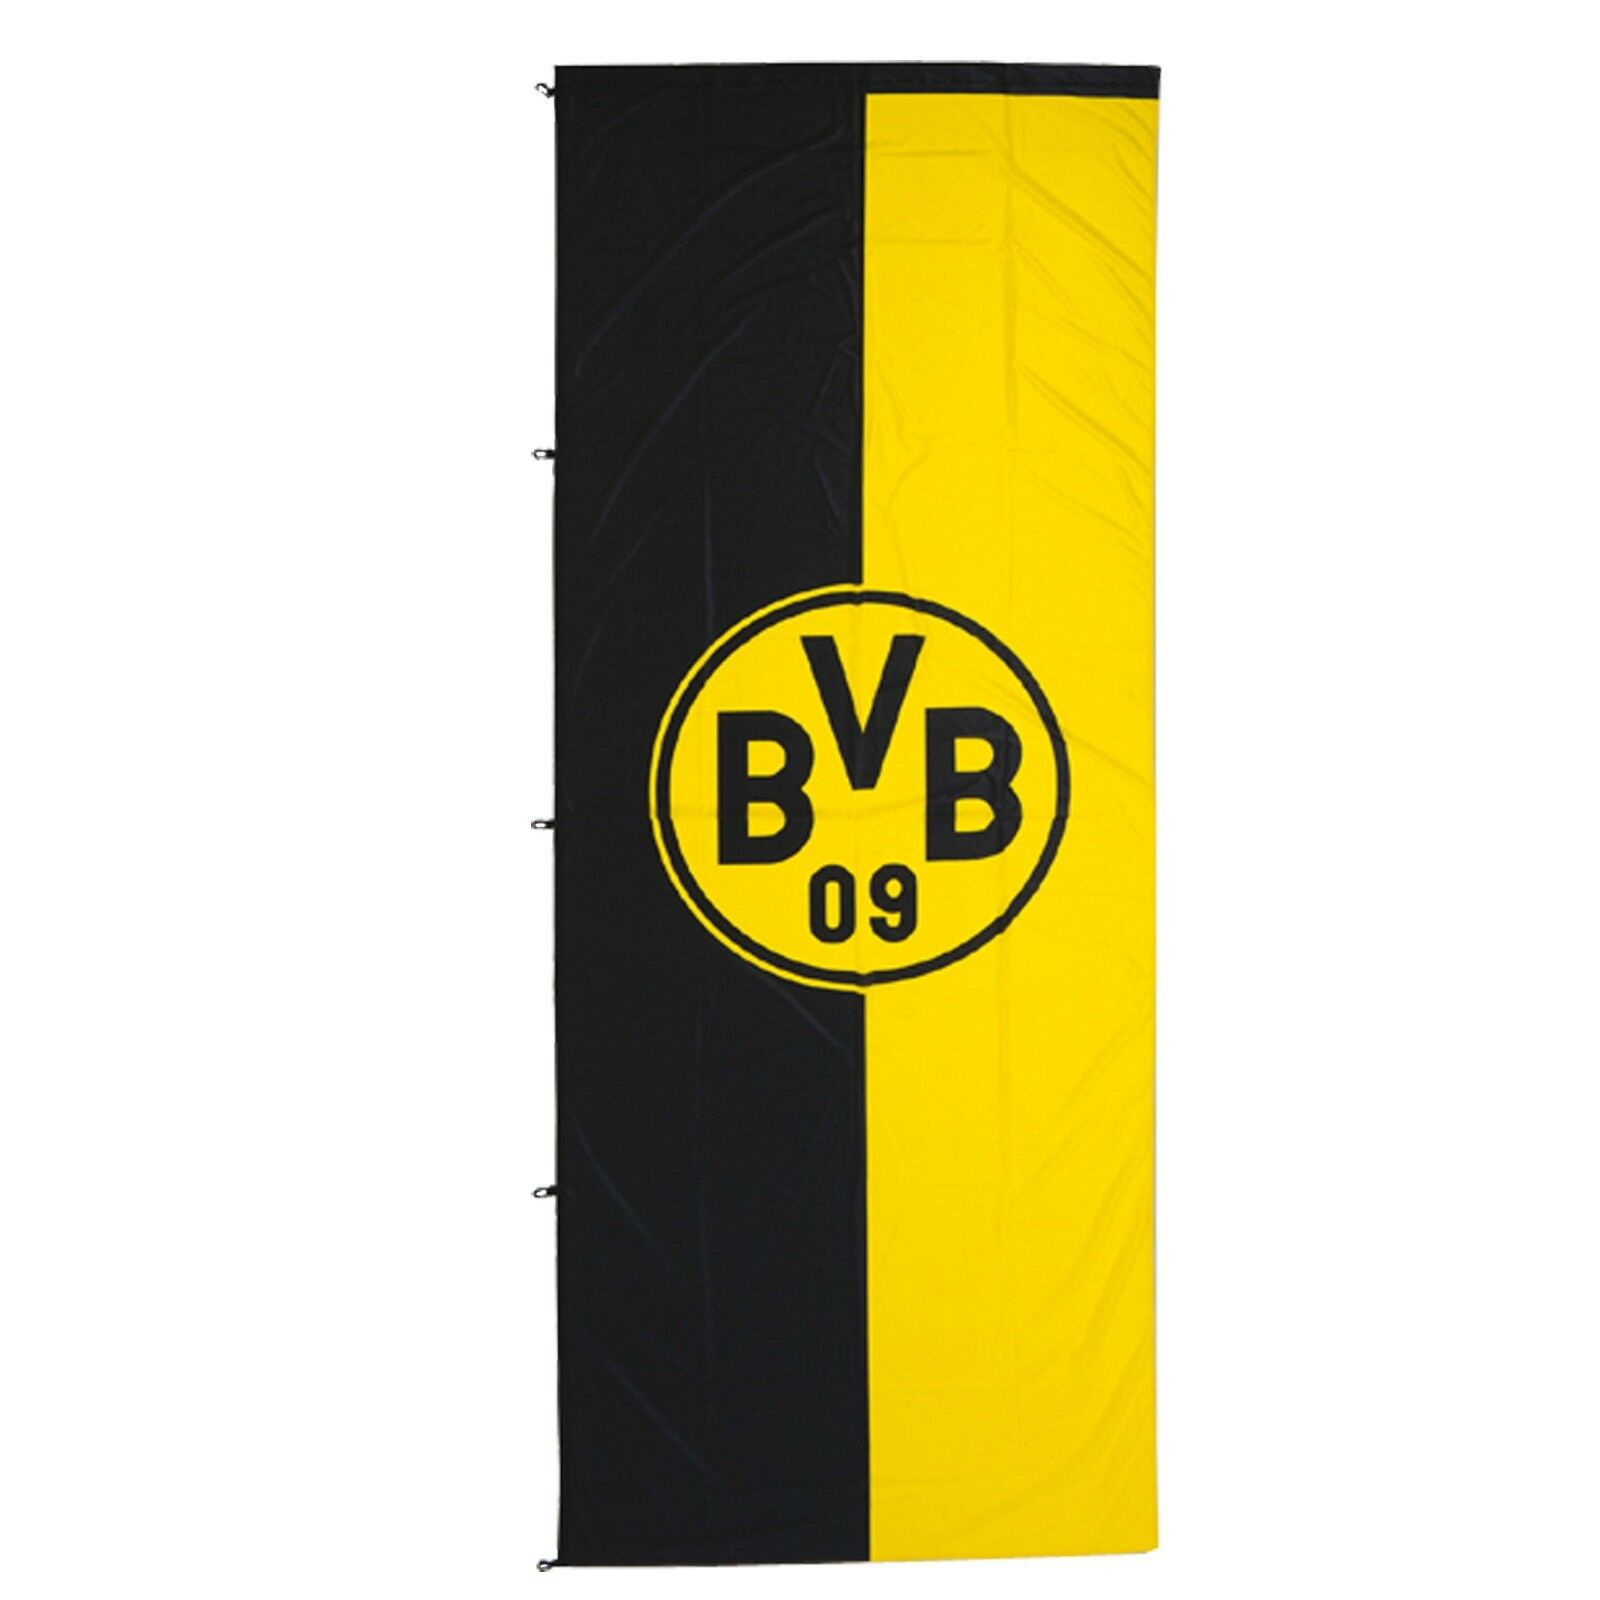 BVB-Hissfahne im Hochformat (150x400 cm) NEU&OVP Borussia Dortmund XXL    Roman